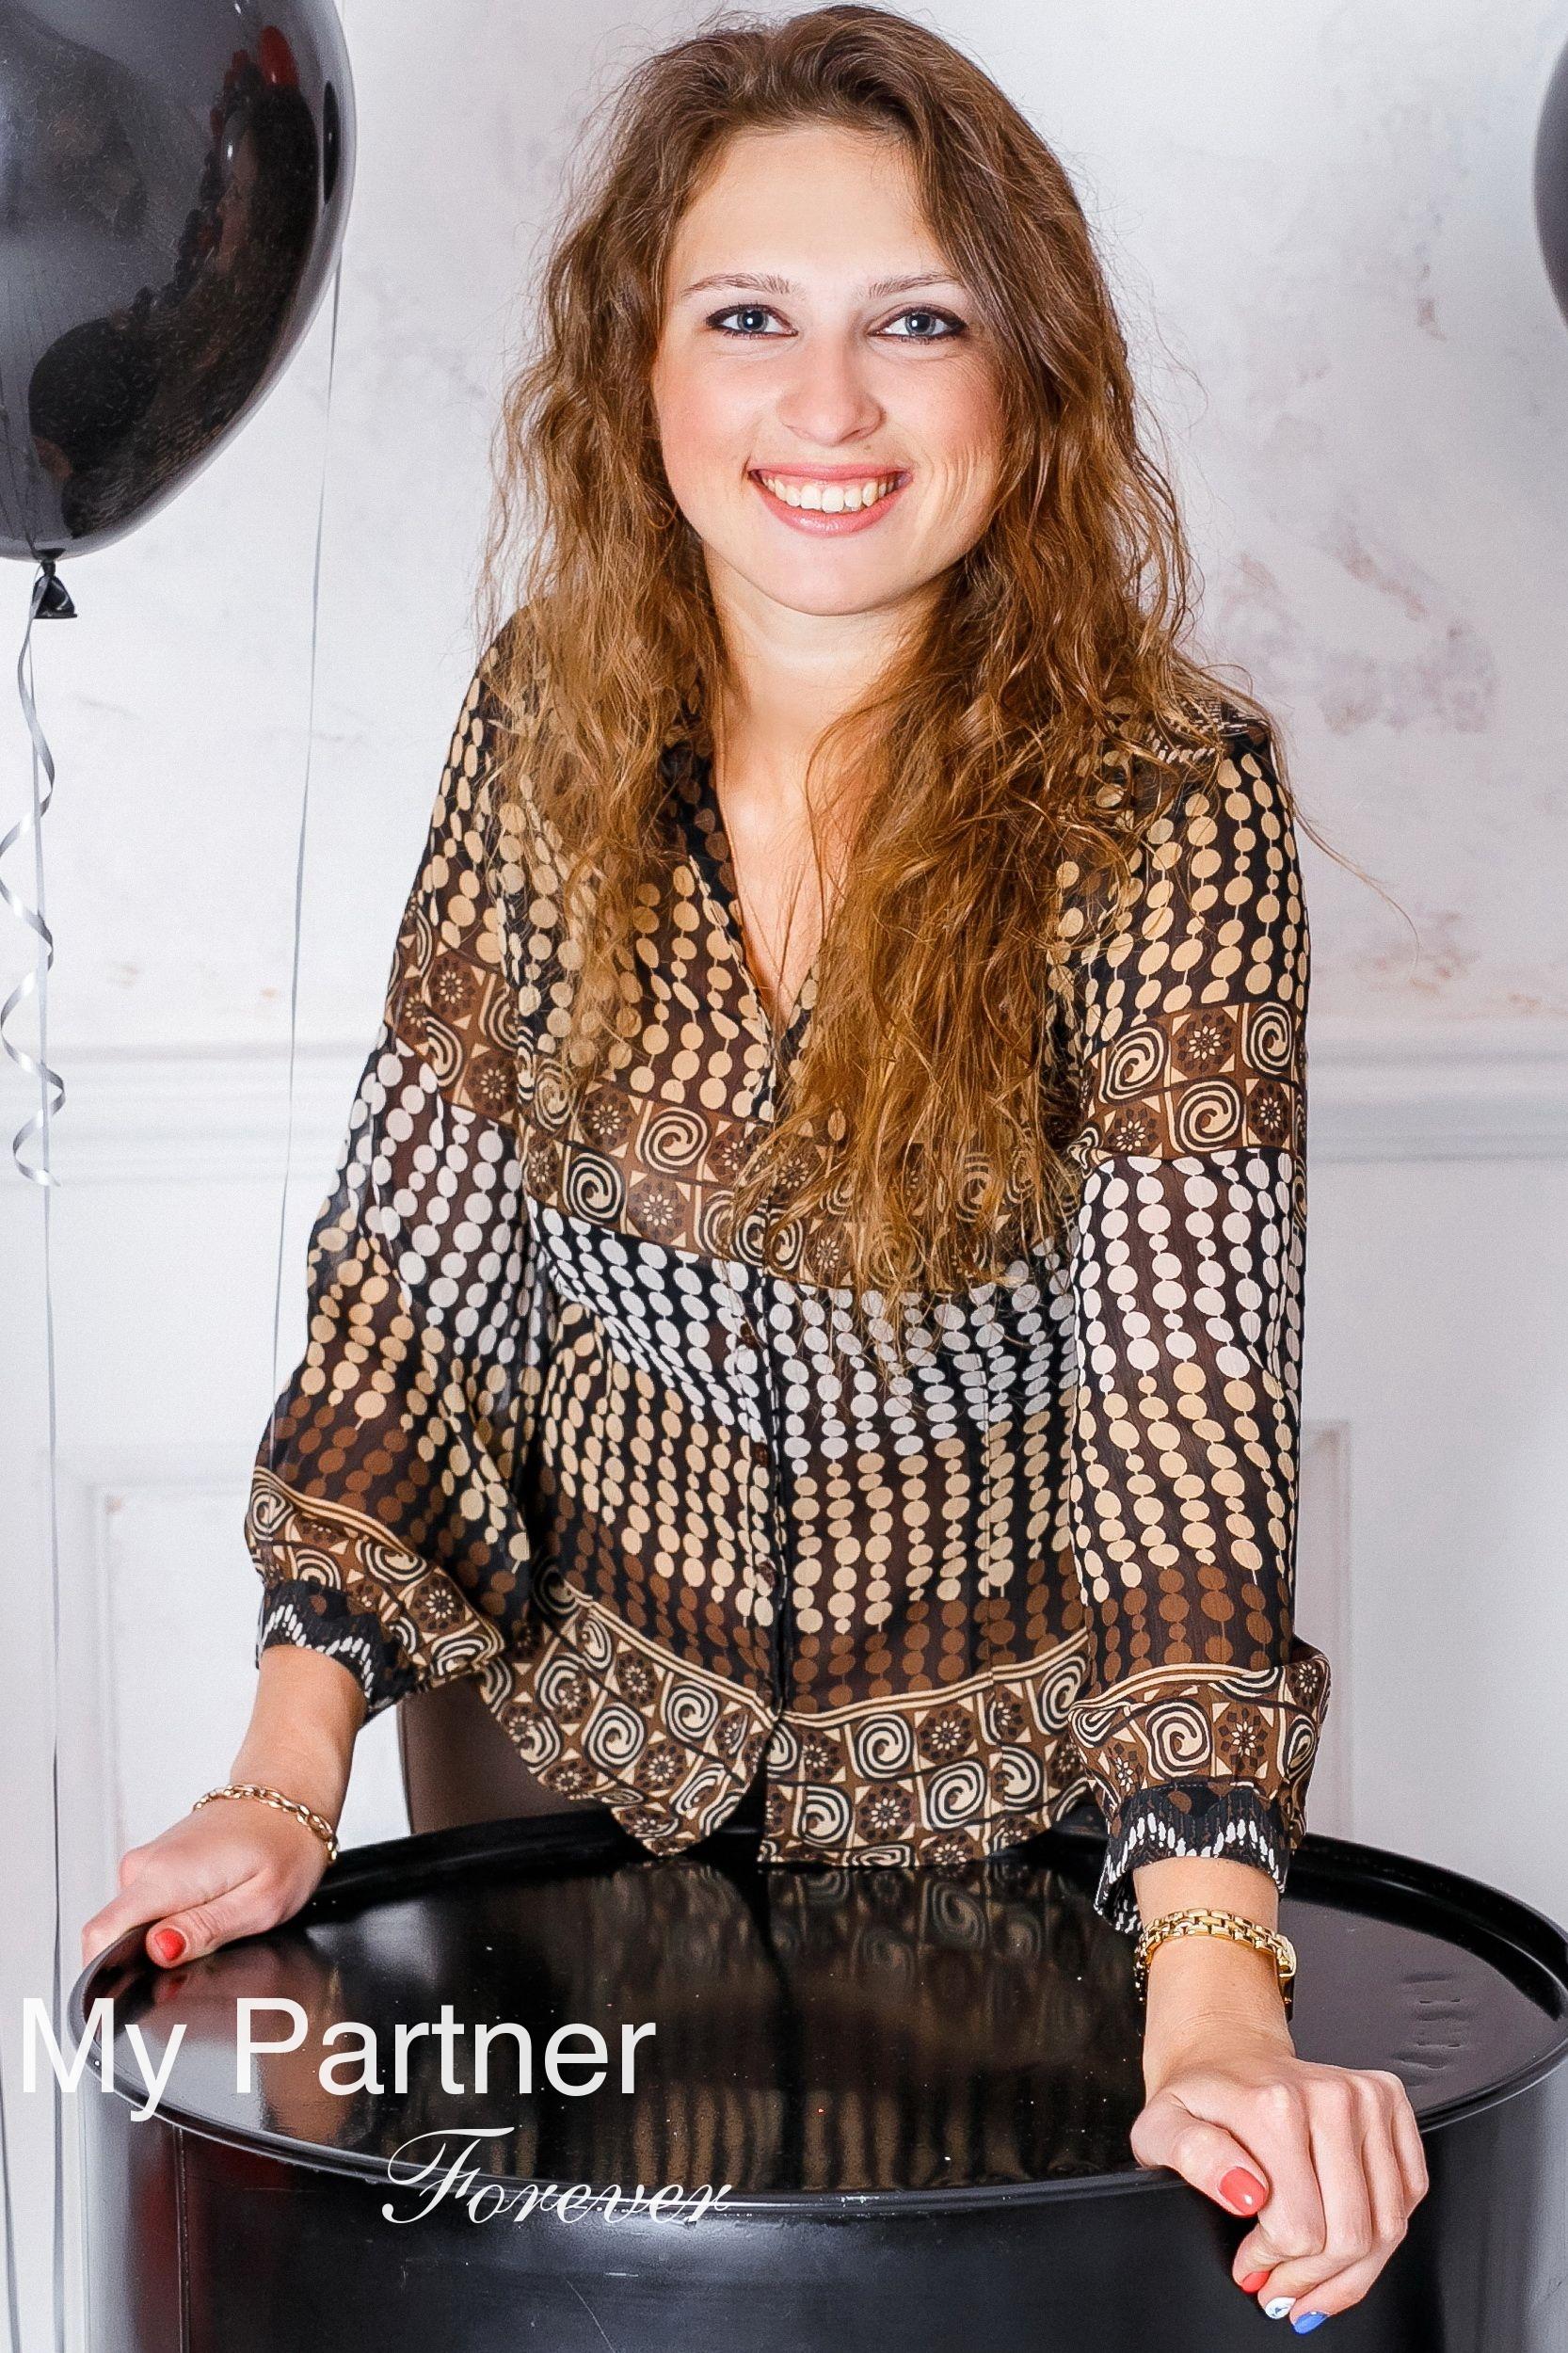 Meet Beautiful Belarusian Girl Nataliya from Grodno, Belarus